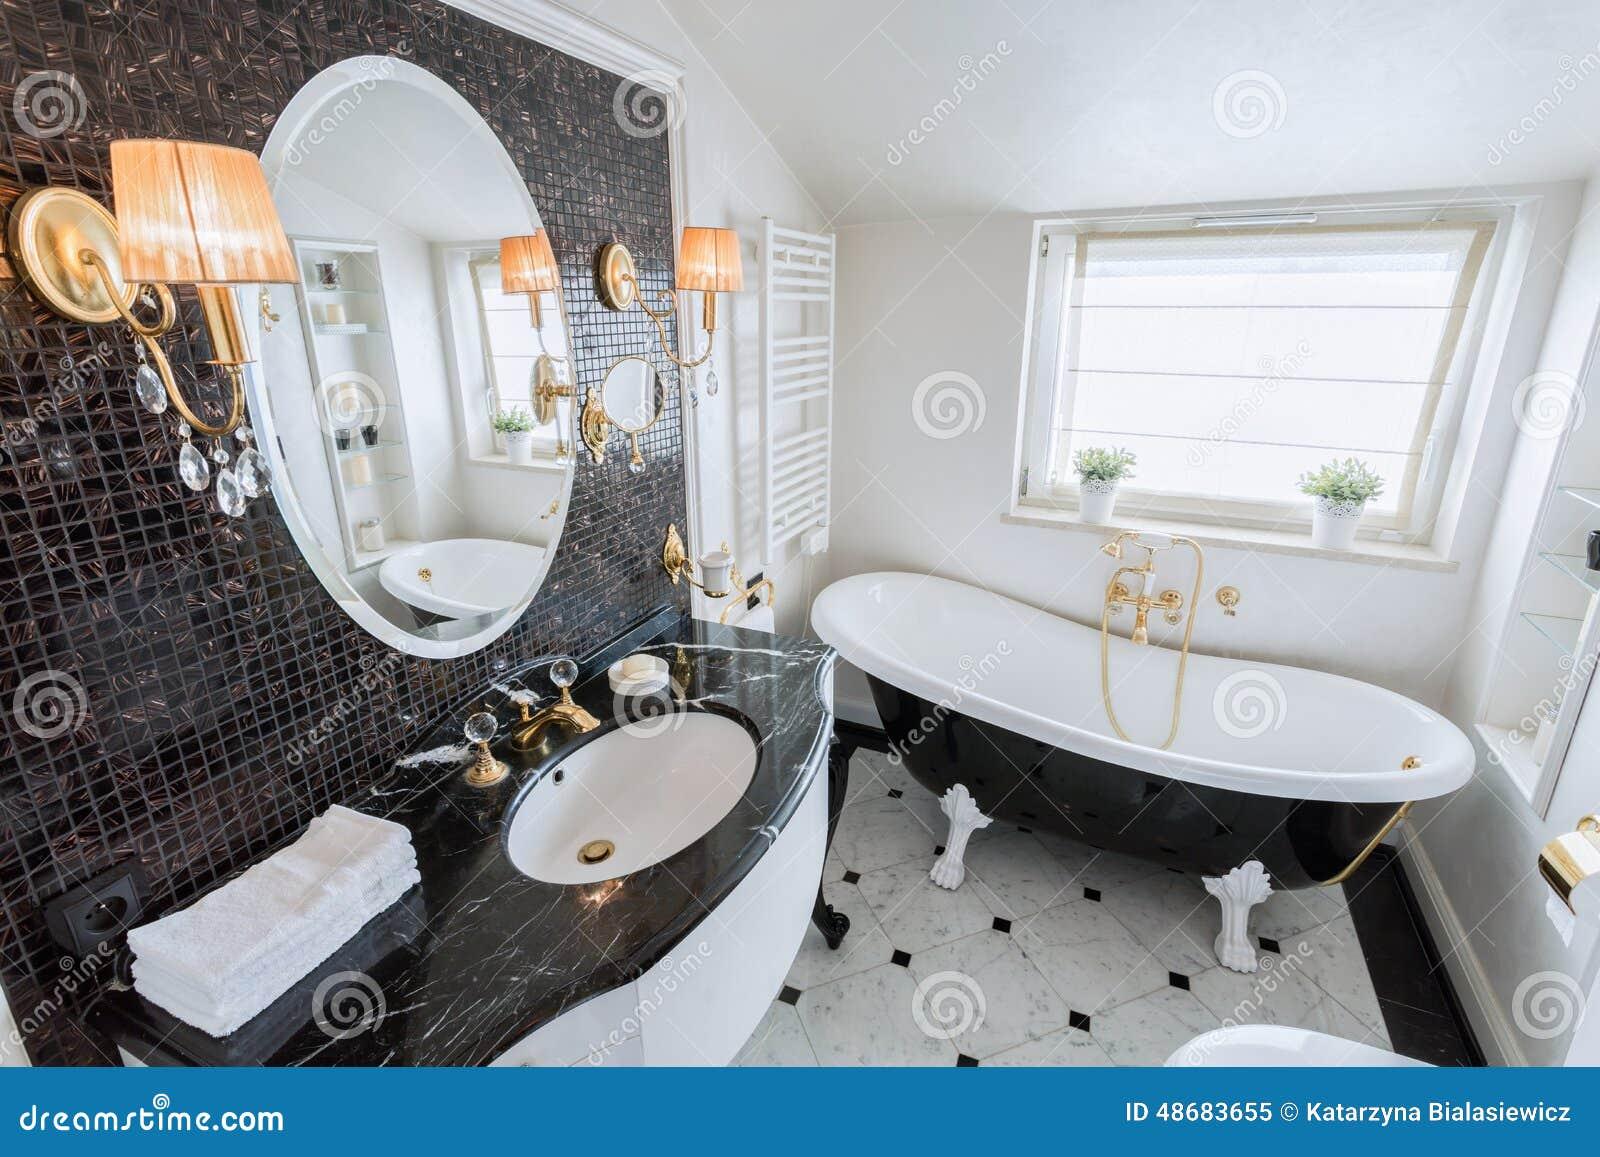 Bright bathroom in baroque style stock photo image 48683655 for Baroque style bathroom